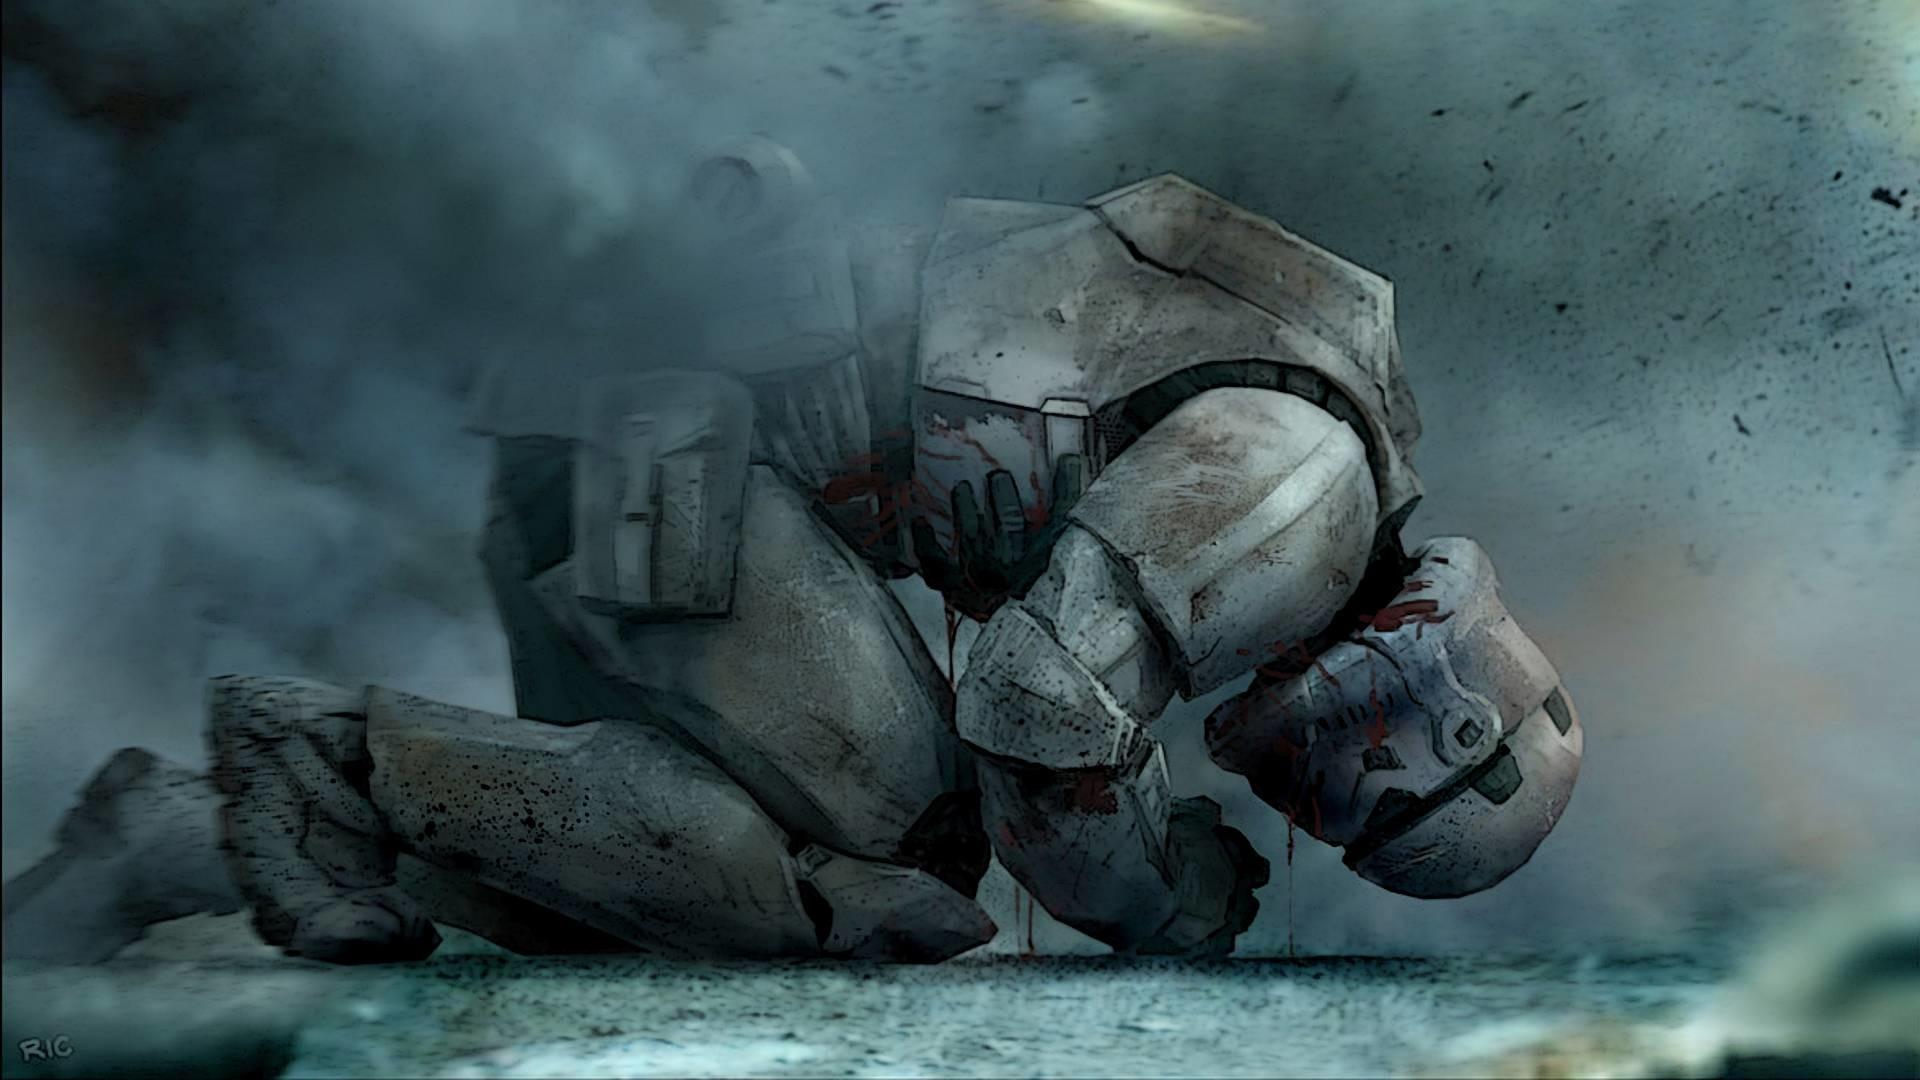 Star Wars Wallpaper Dump – Album on Imgur